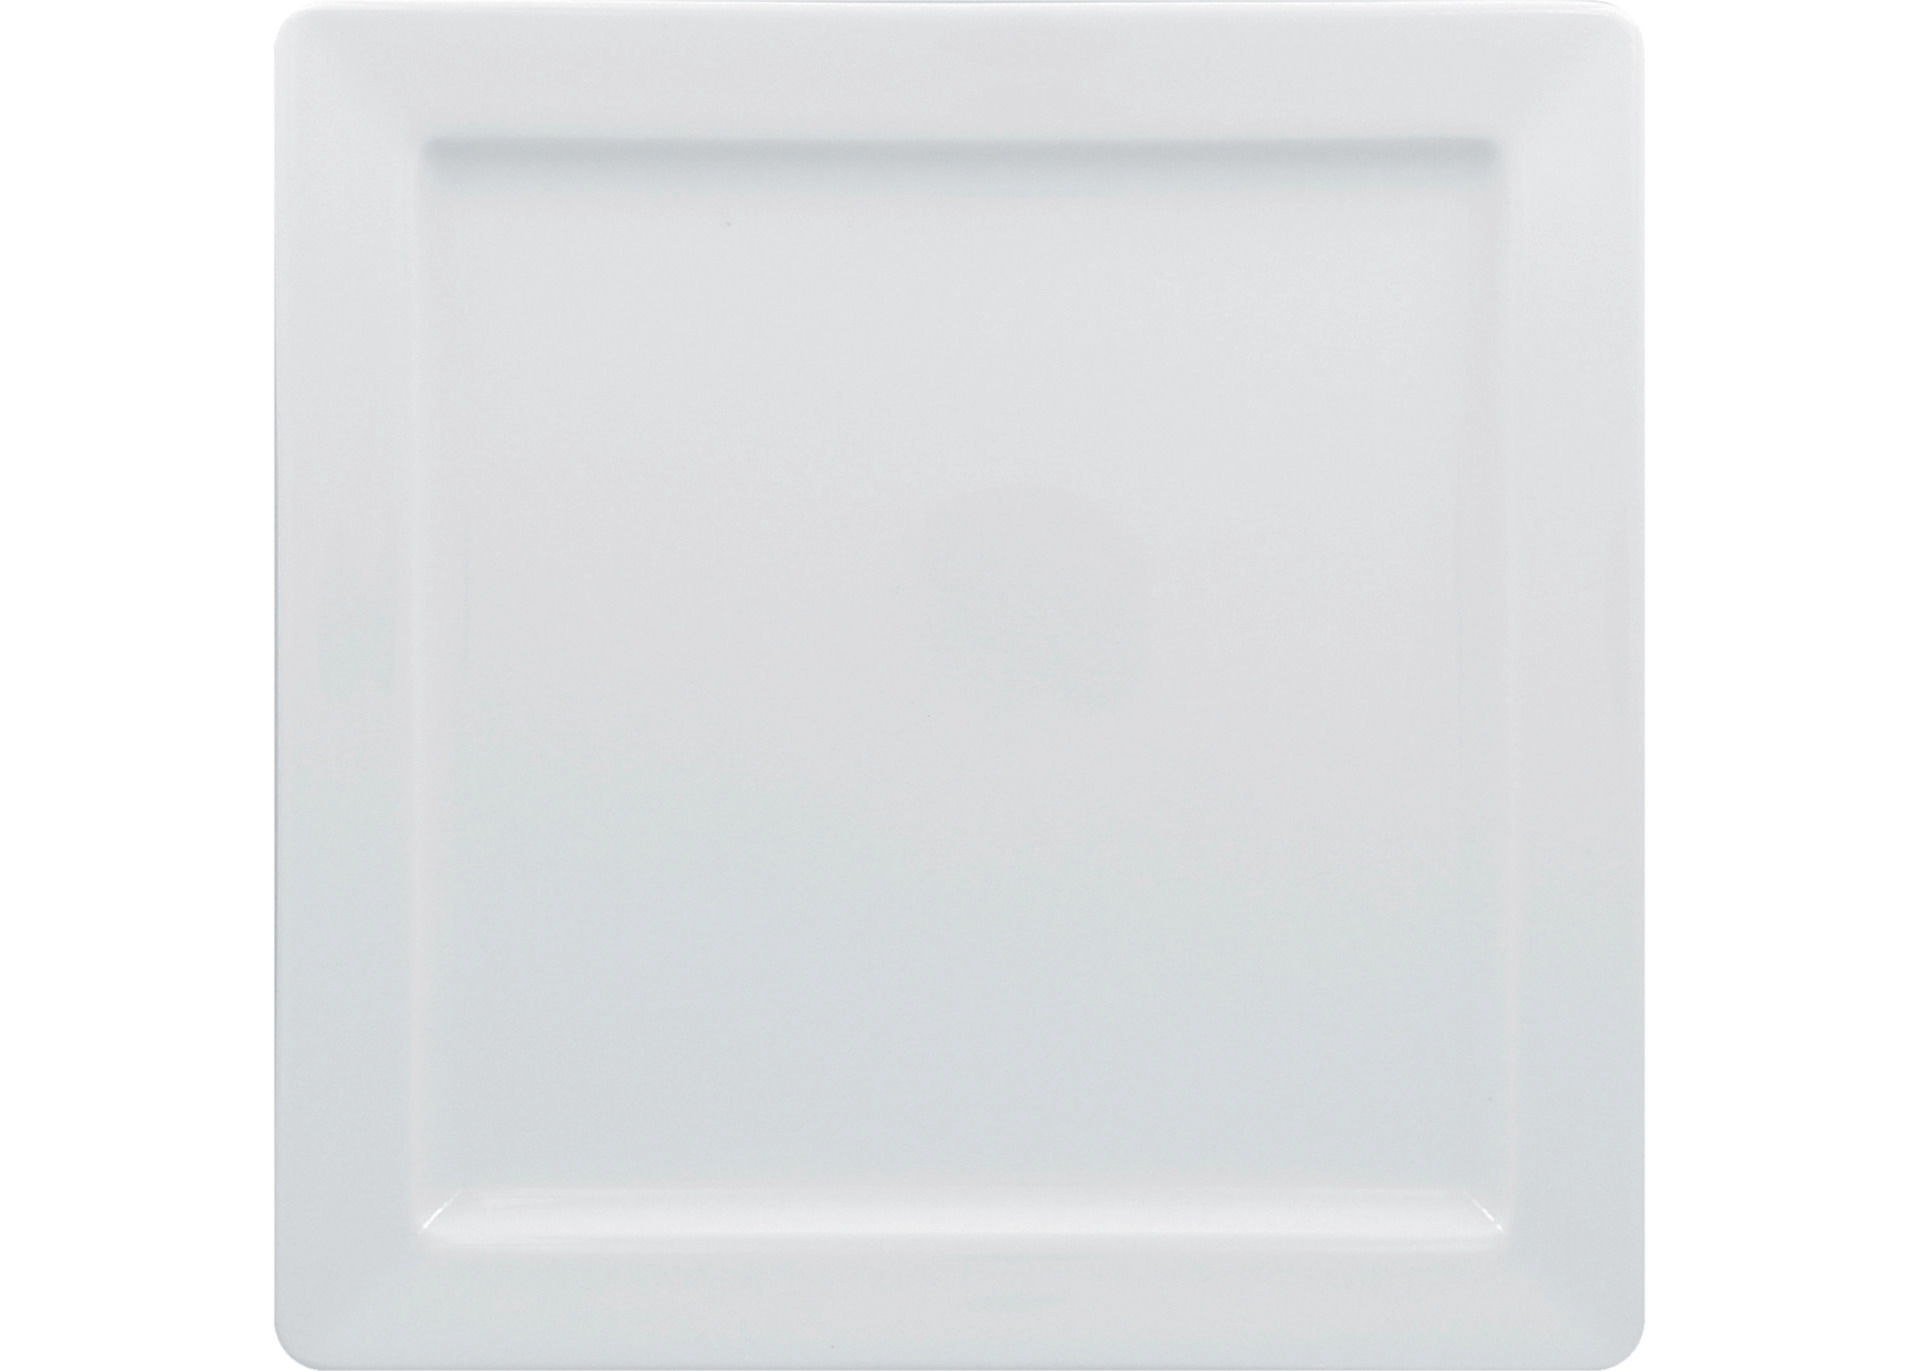 Teller quadratisch 270 x 270 mm bright-white